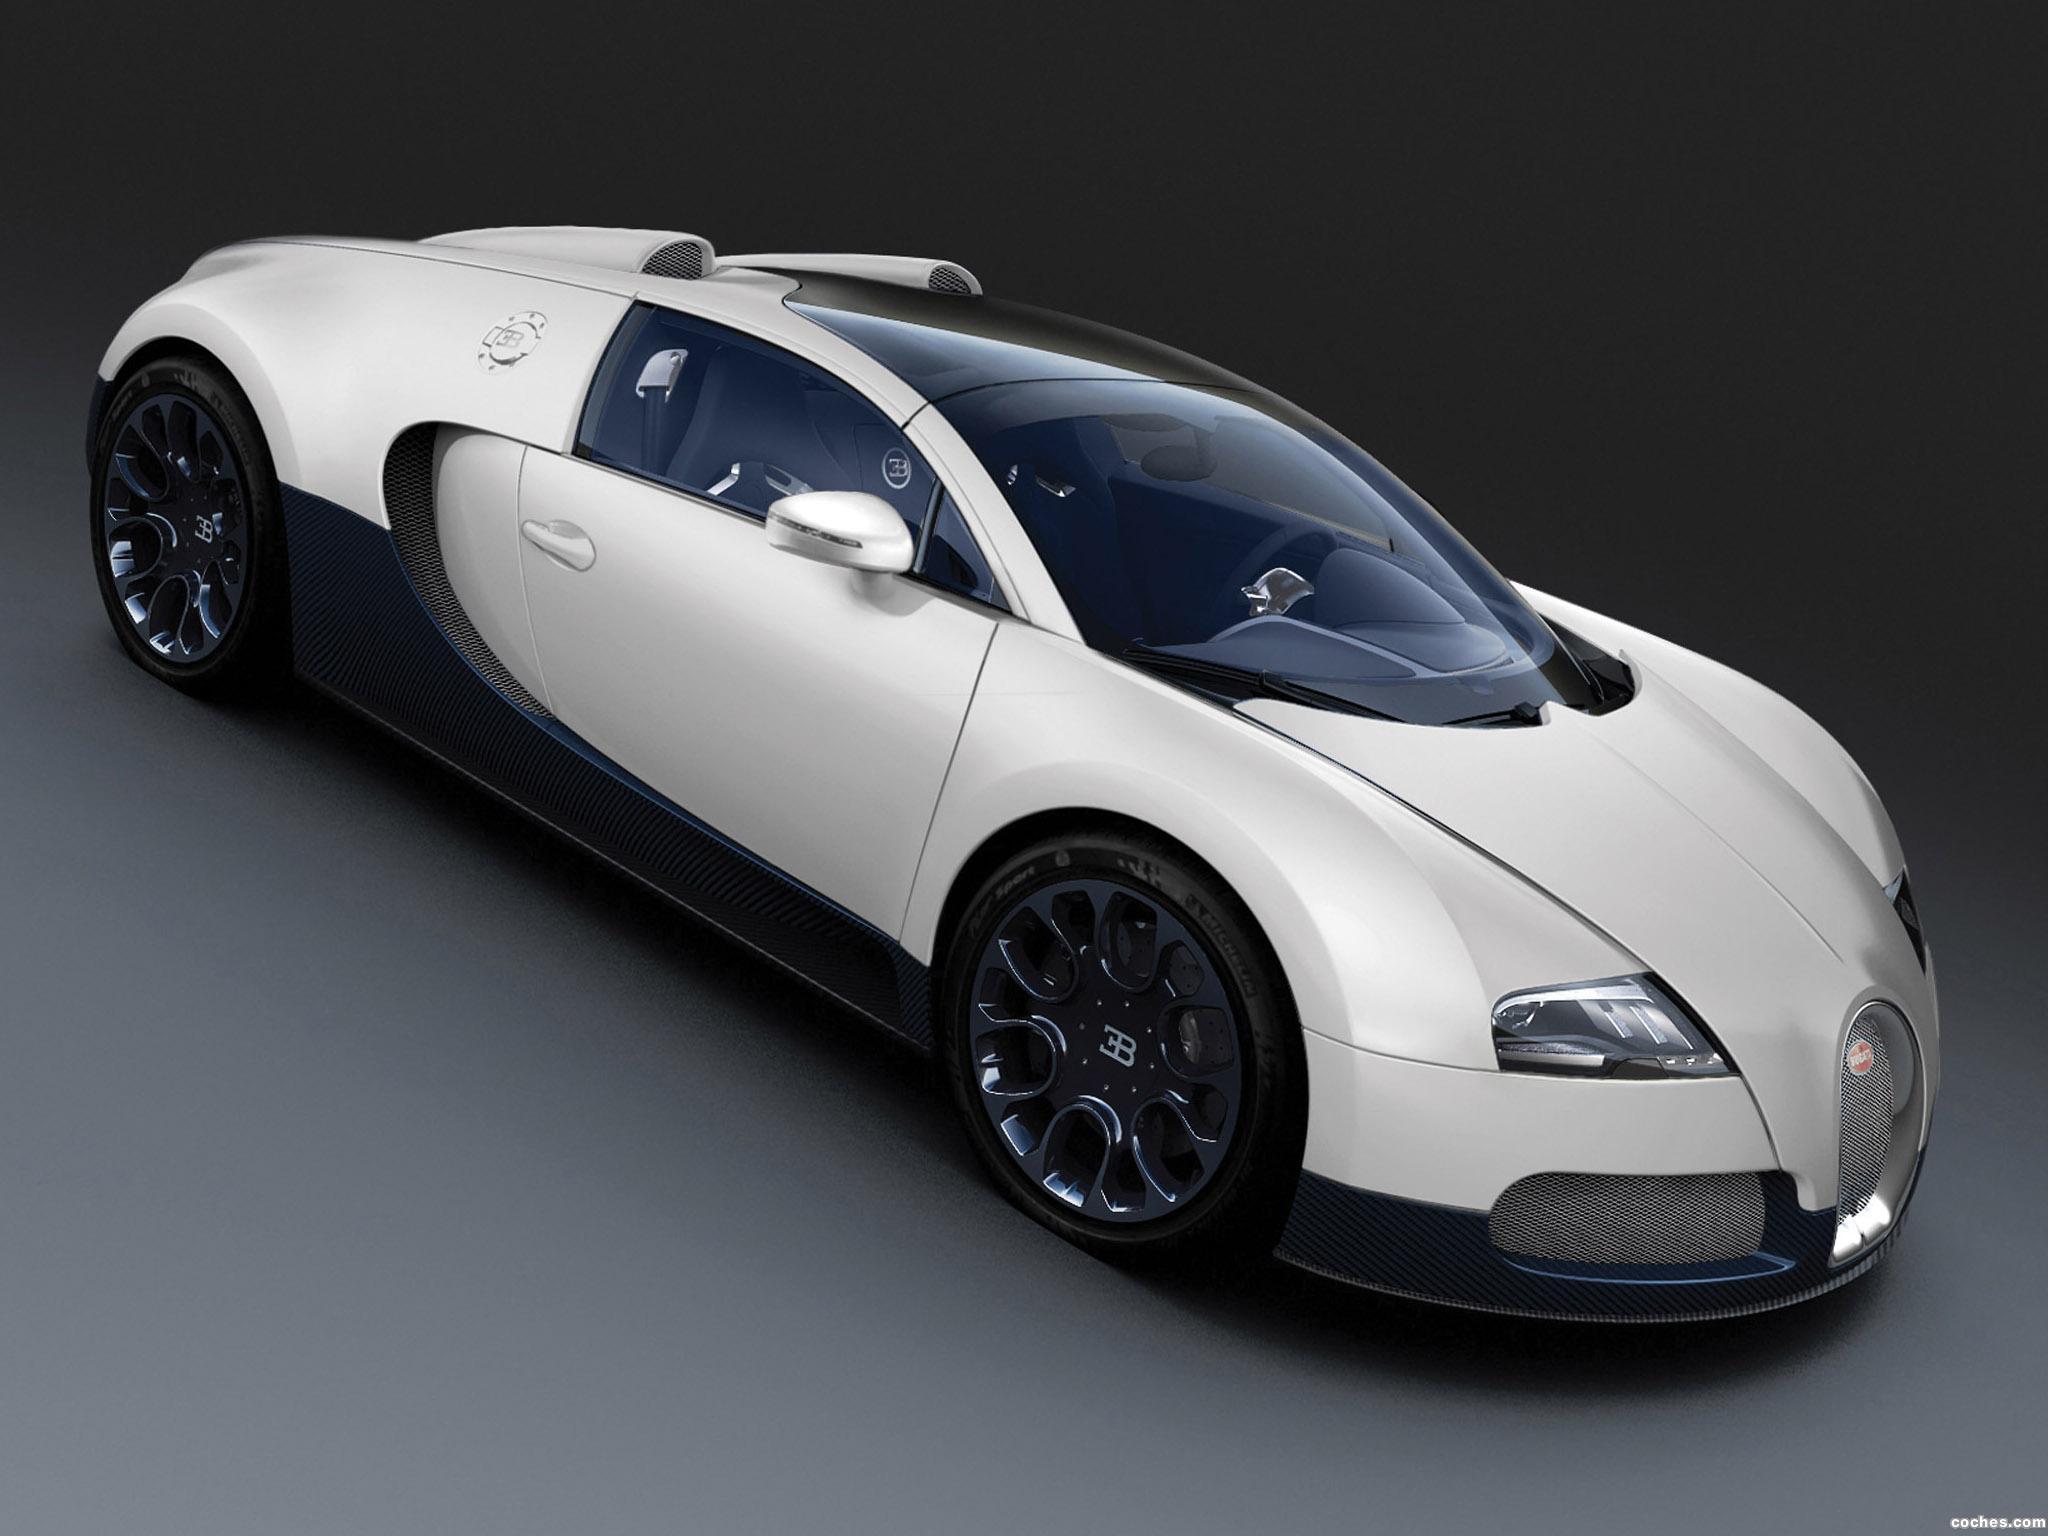 Foto 1 de Bugatti eyron Grand Sport Shanghai Edition 2011